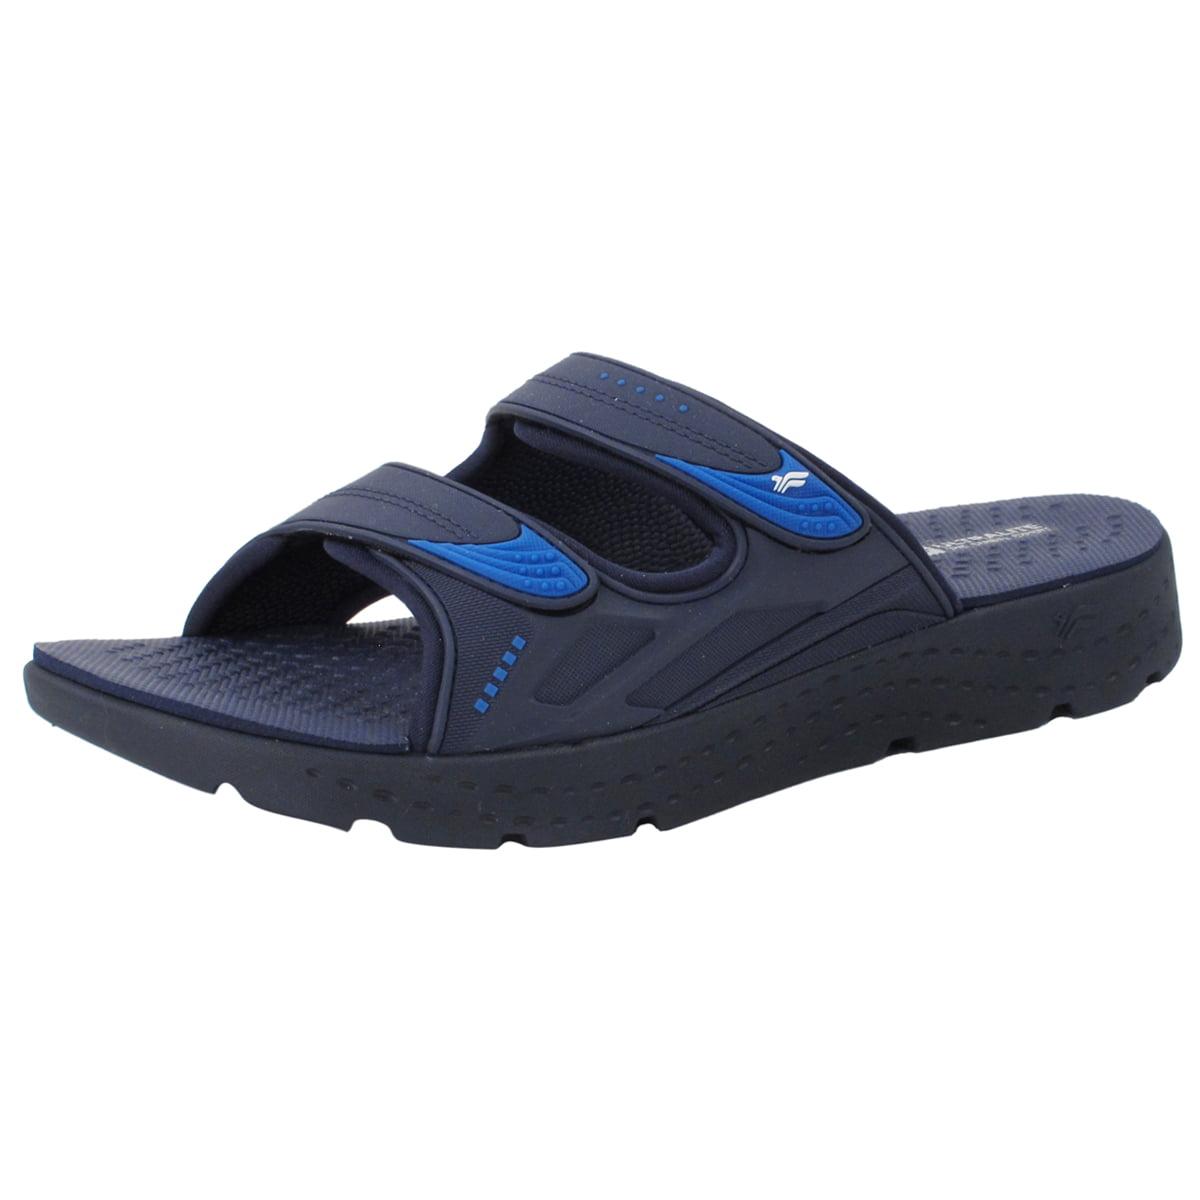 Ultra Light Weight Outdoor Water Flip Flops for Men /& Women by Gold Pigeon Shoes